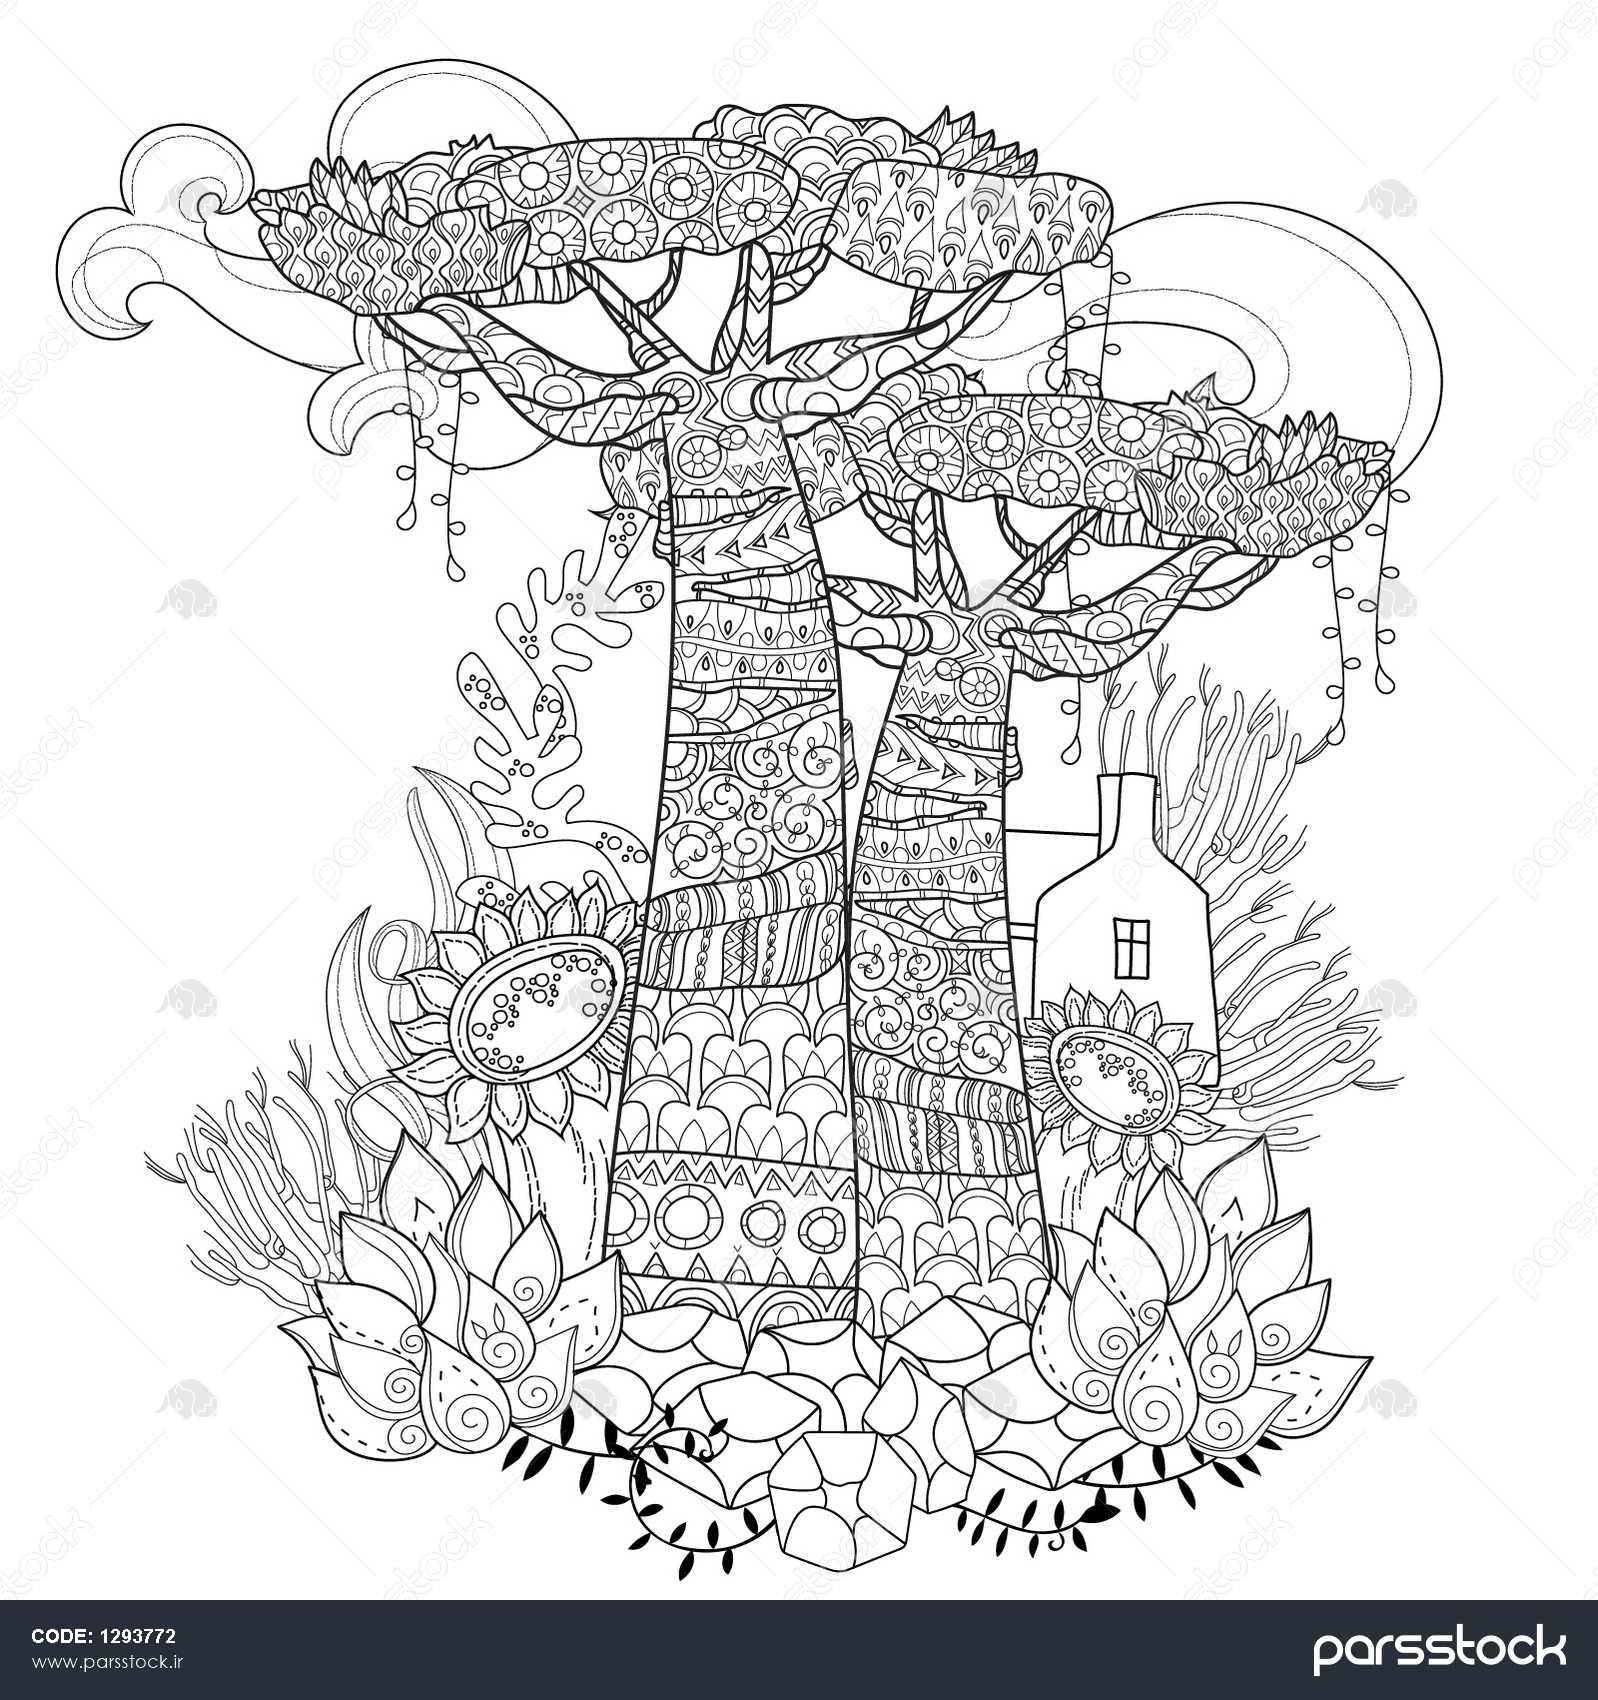 outline drawings of flowers